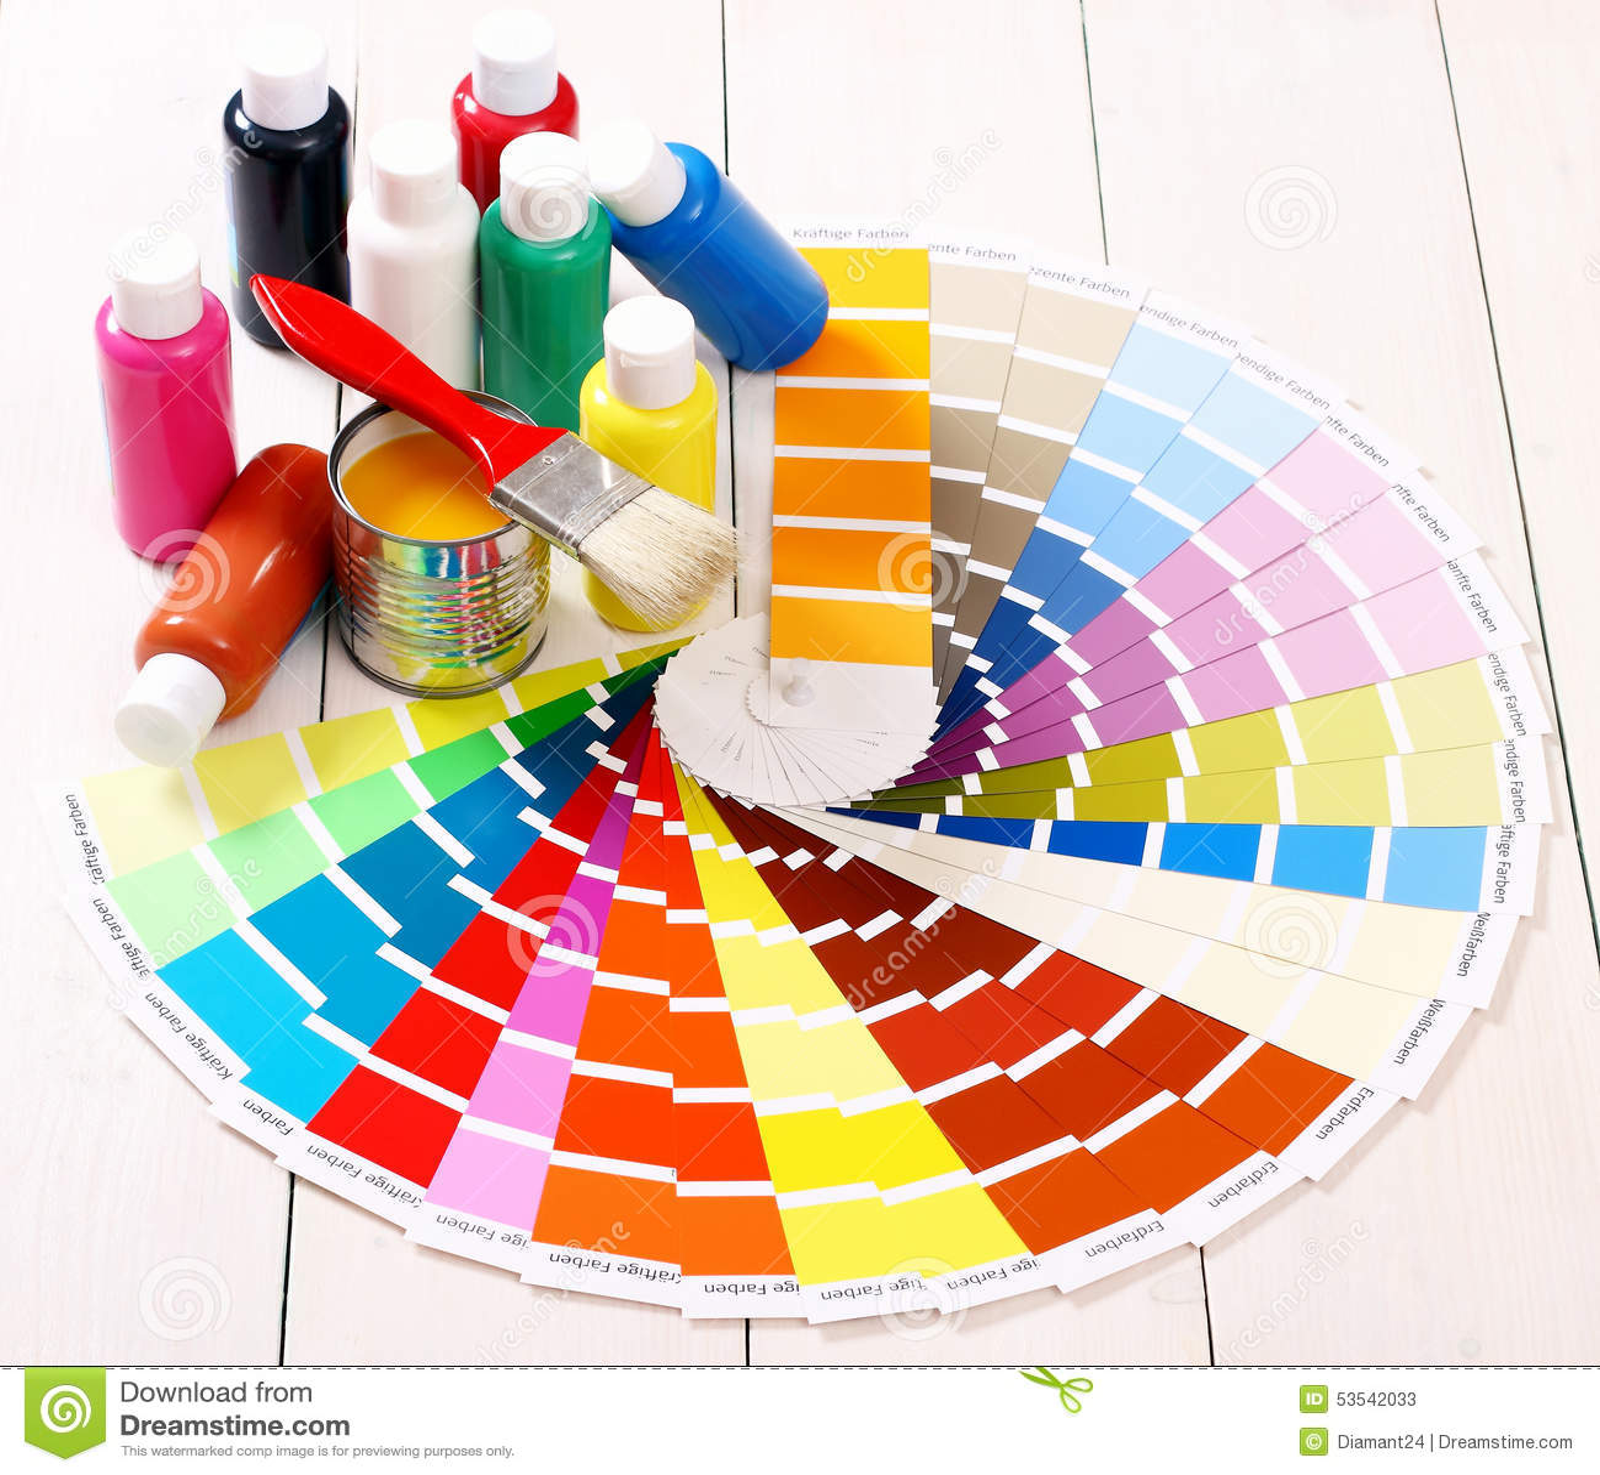 pantone color palette brush on white wooden stock photo image